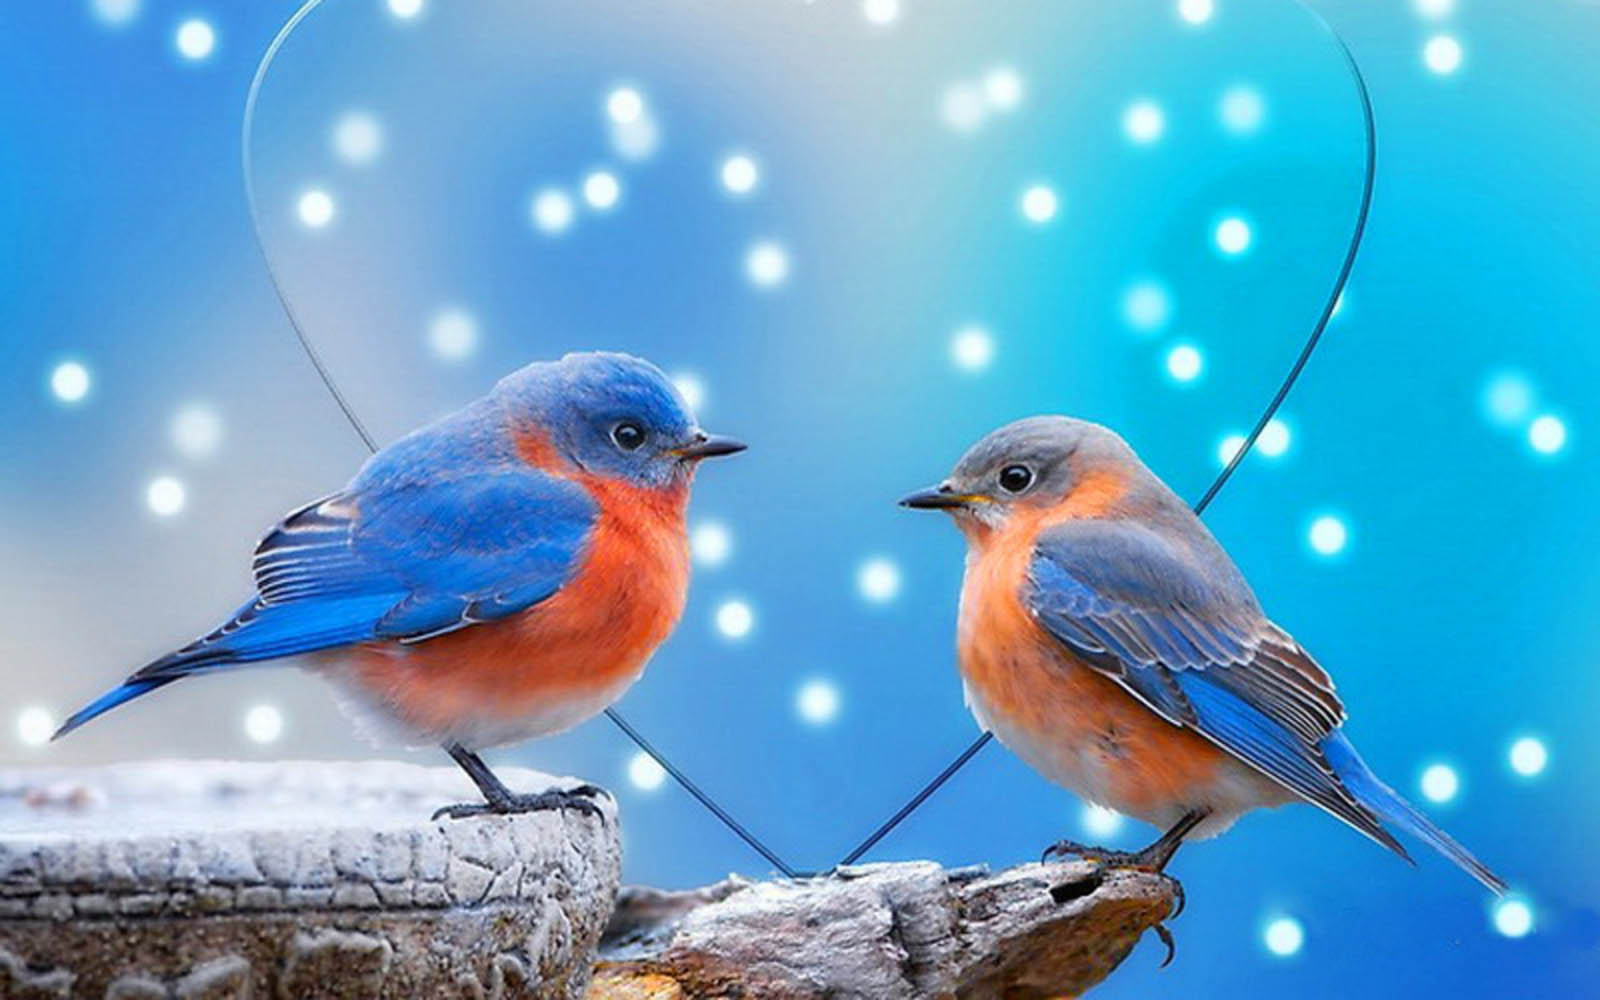 Love Bird Wallpaper Hd Free Wallpaper Download Best Wallpaper Site